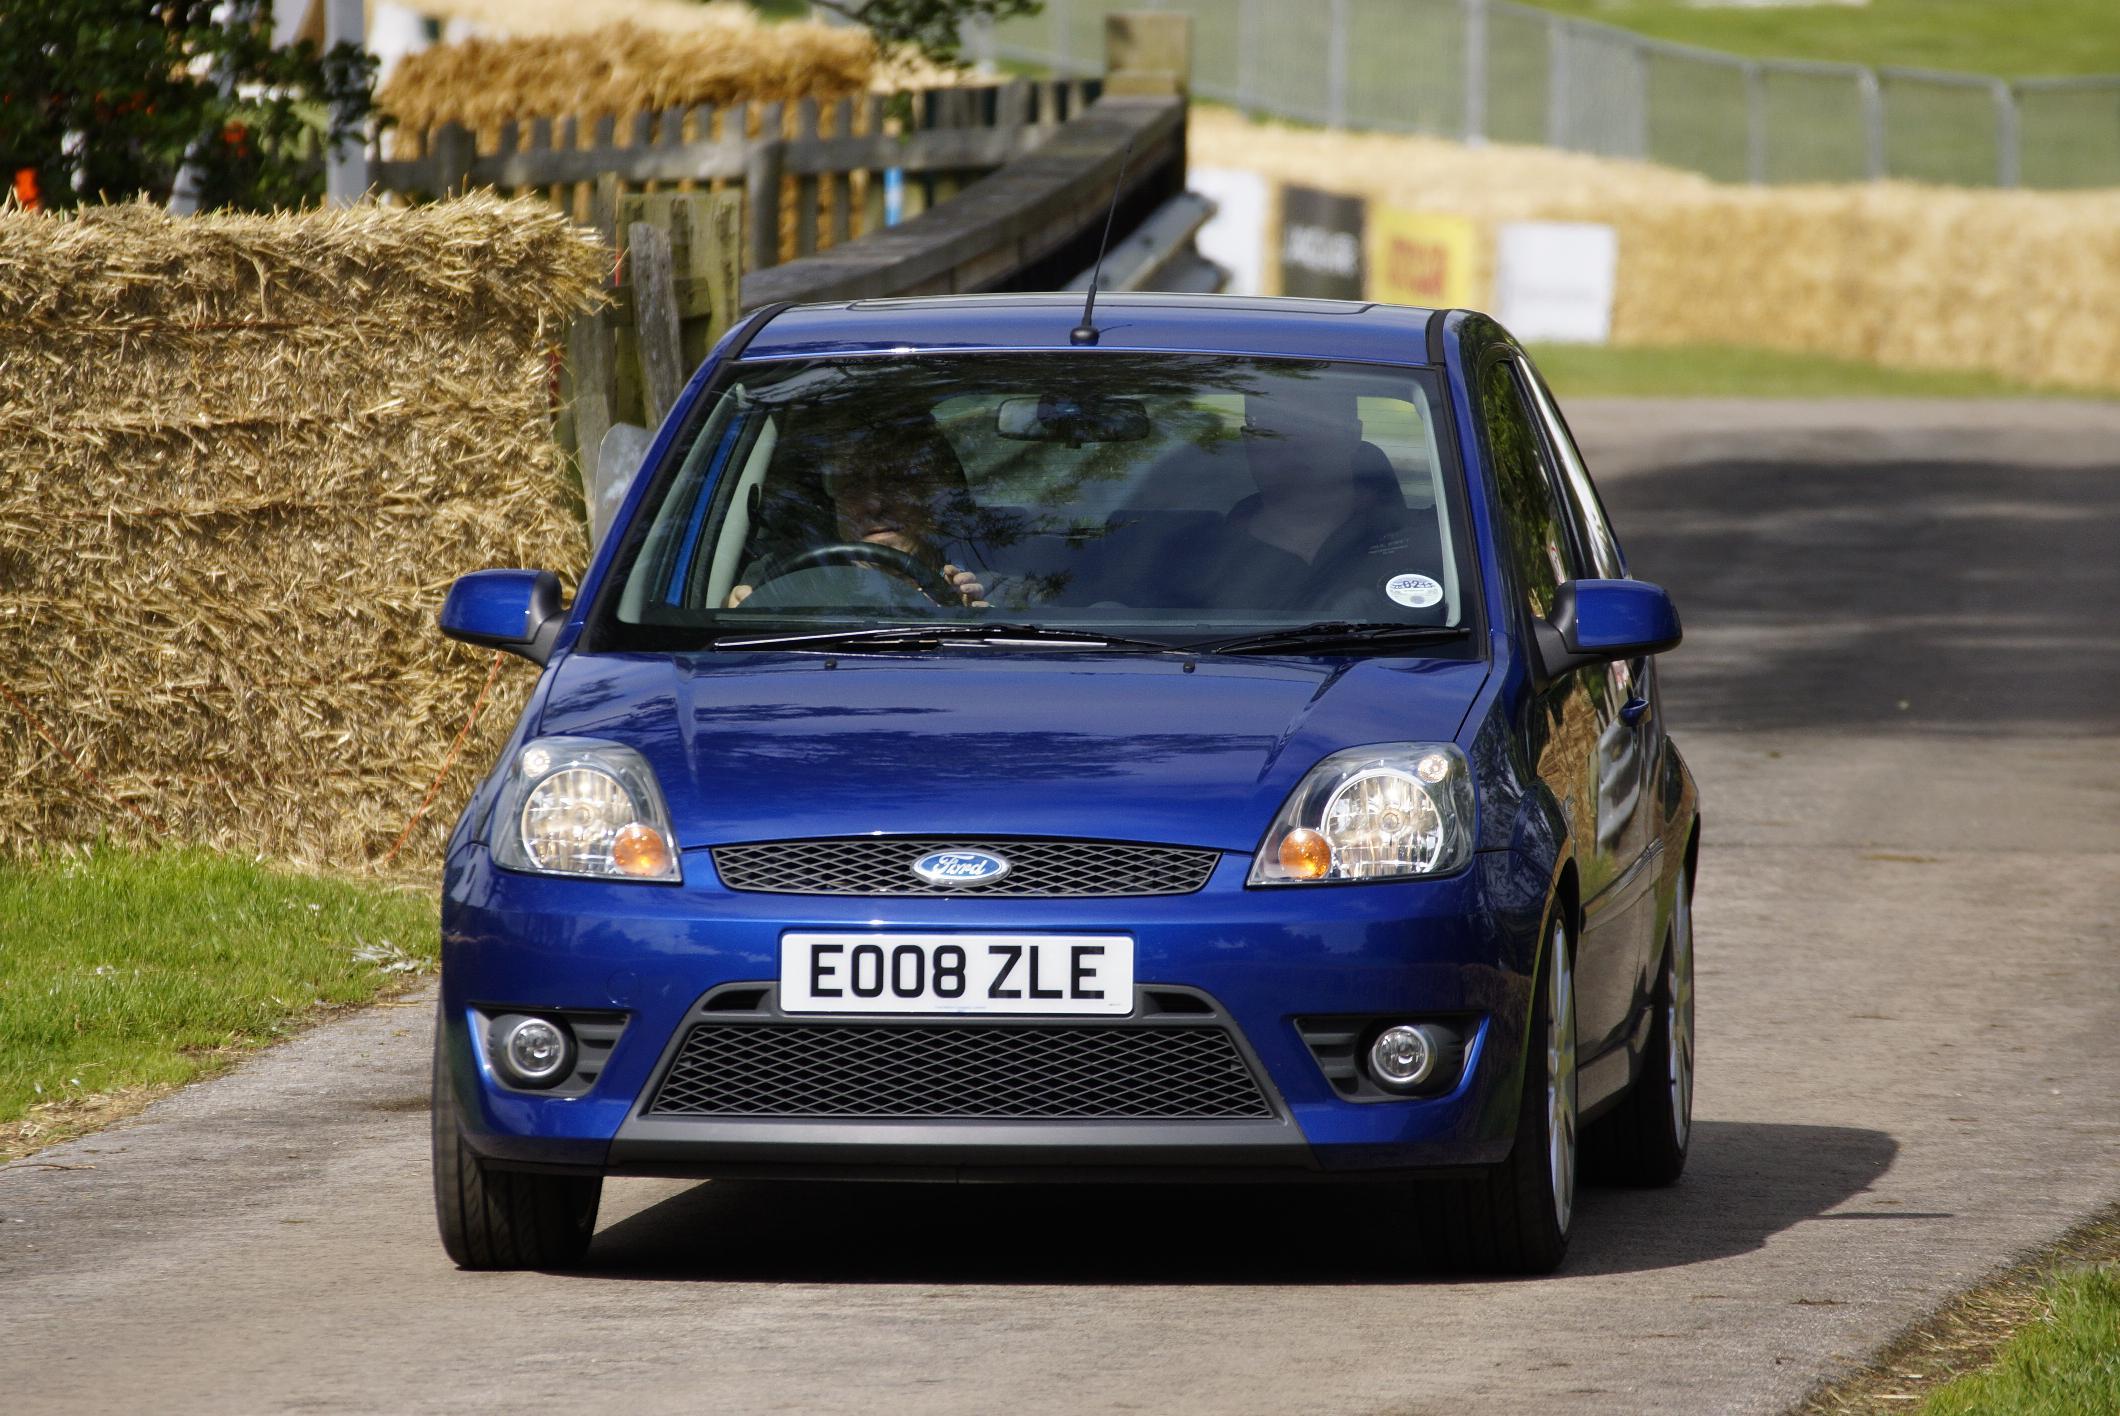 Ford Fiesta ST Cholmondeley 2012